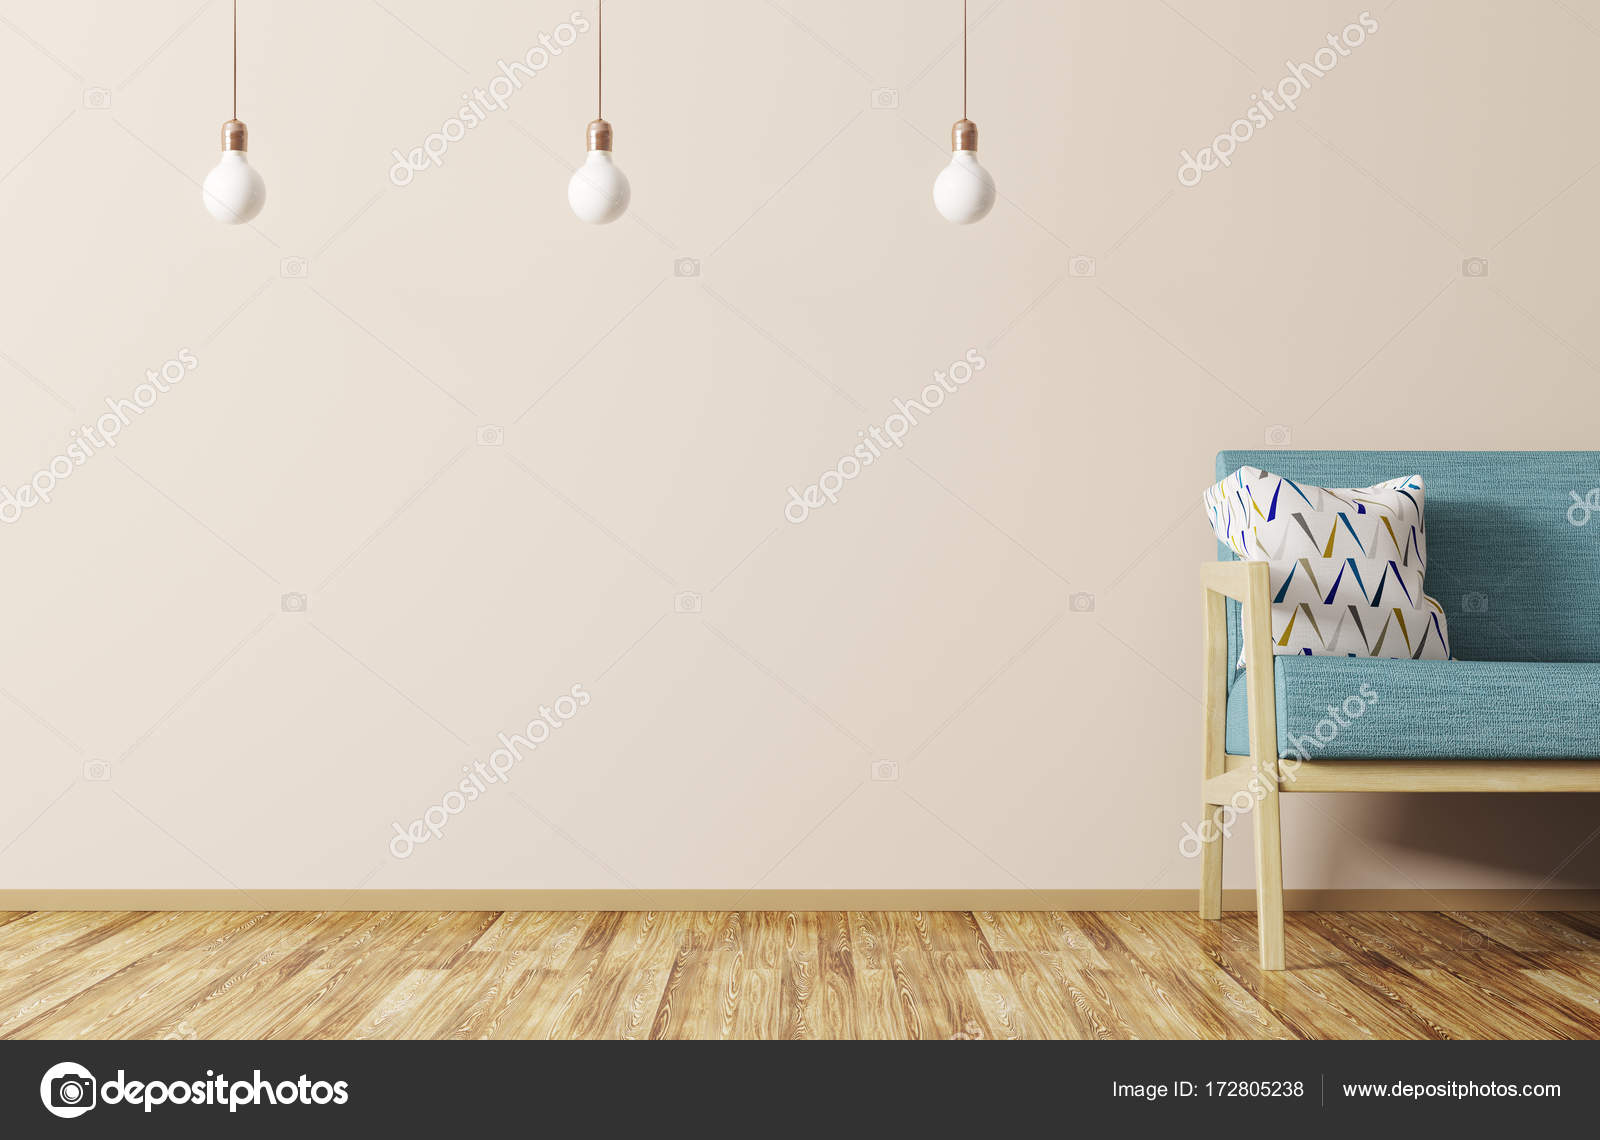 Woonkamer Lampen Modern : Modern interieur van een woonkamer met sofa en lampen d